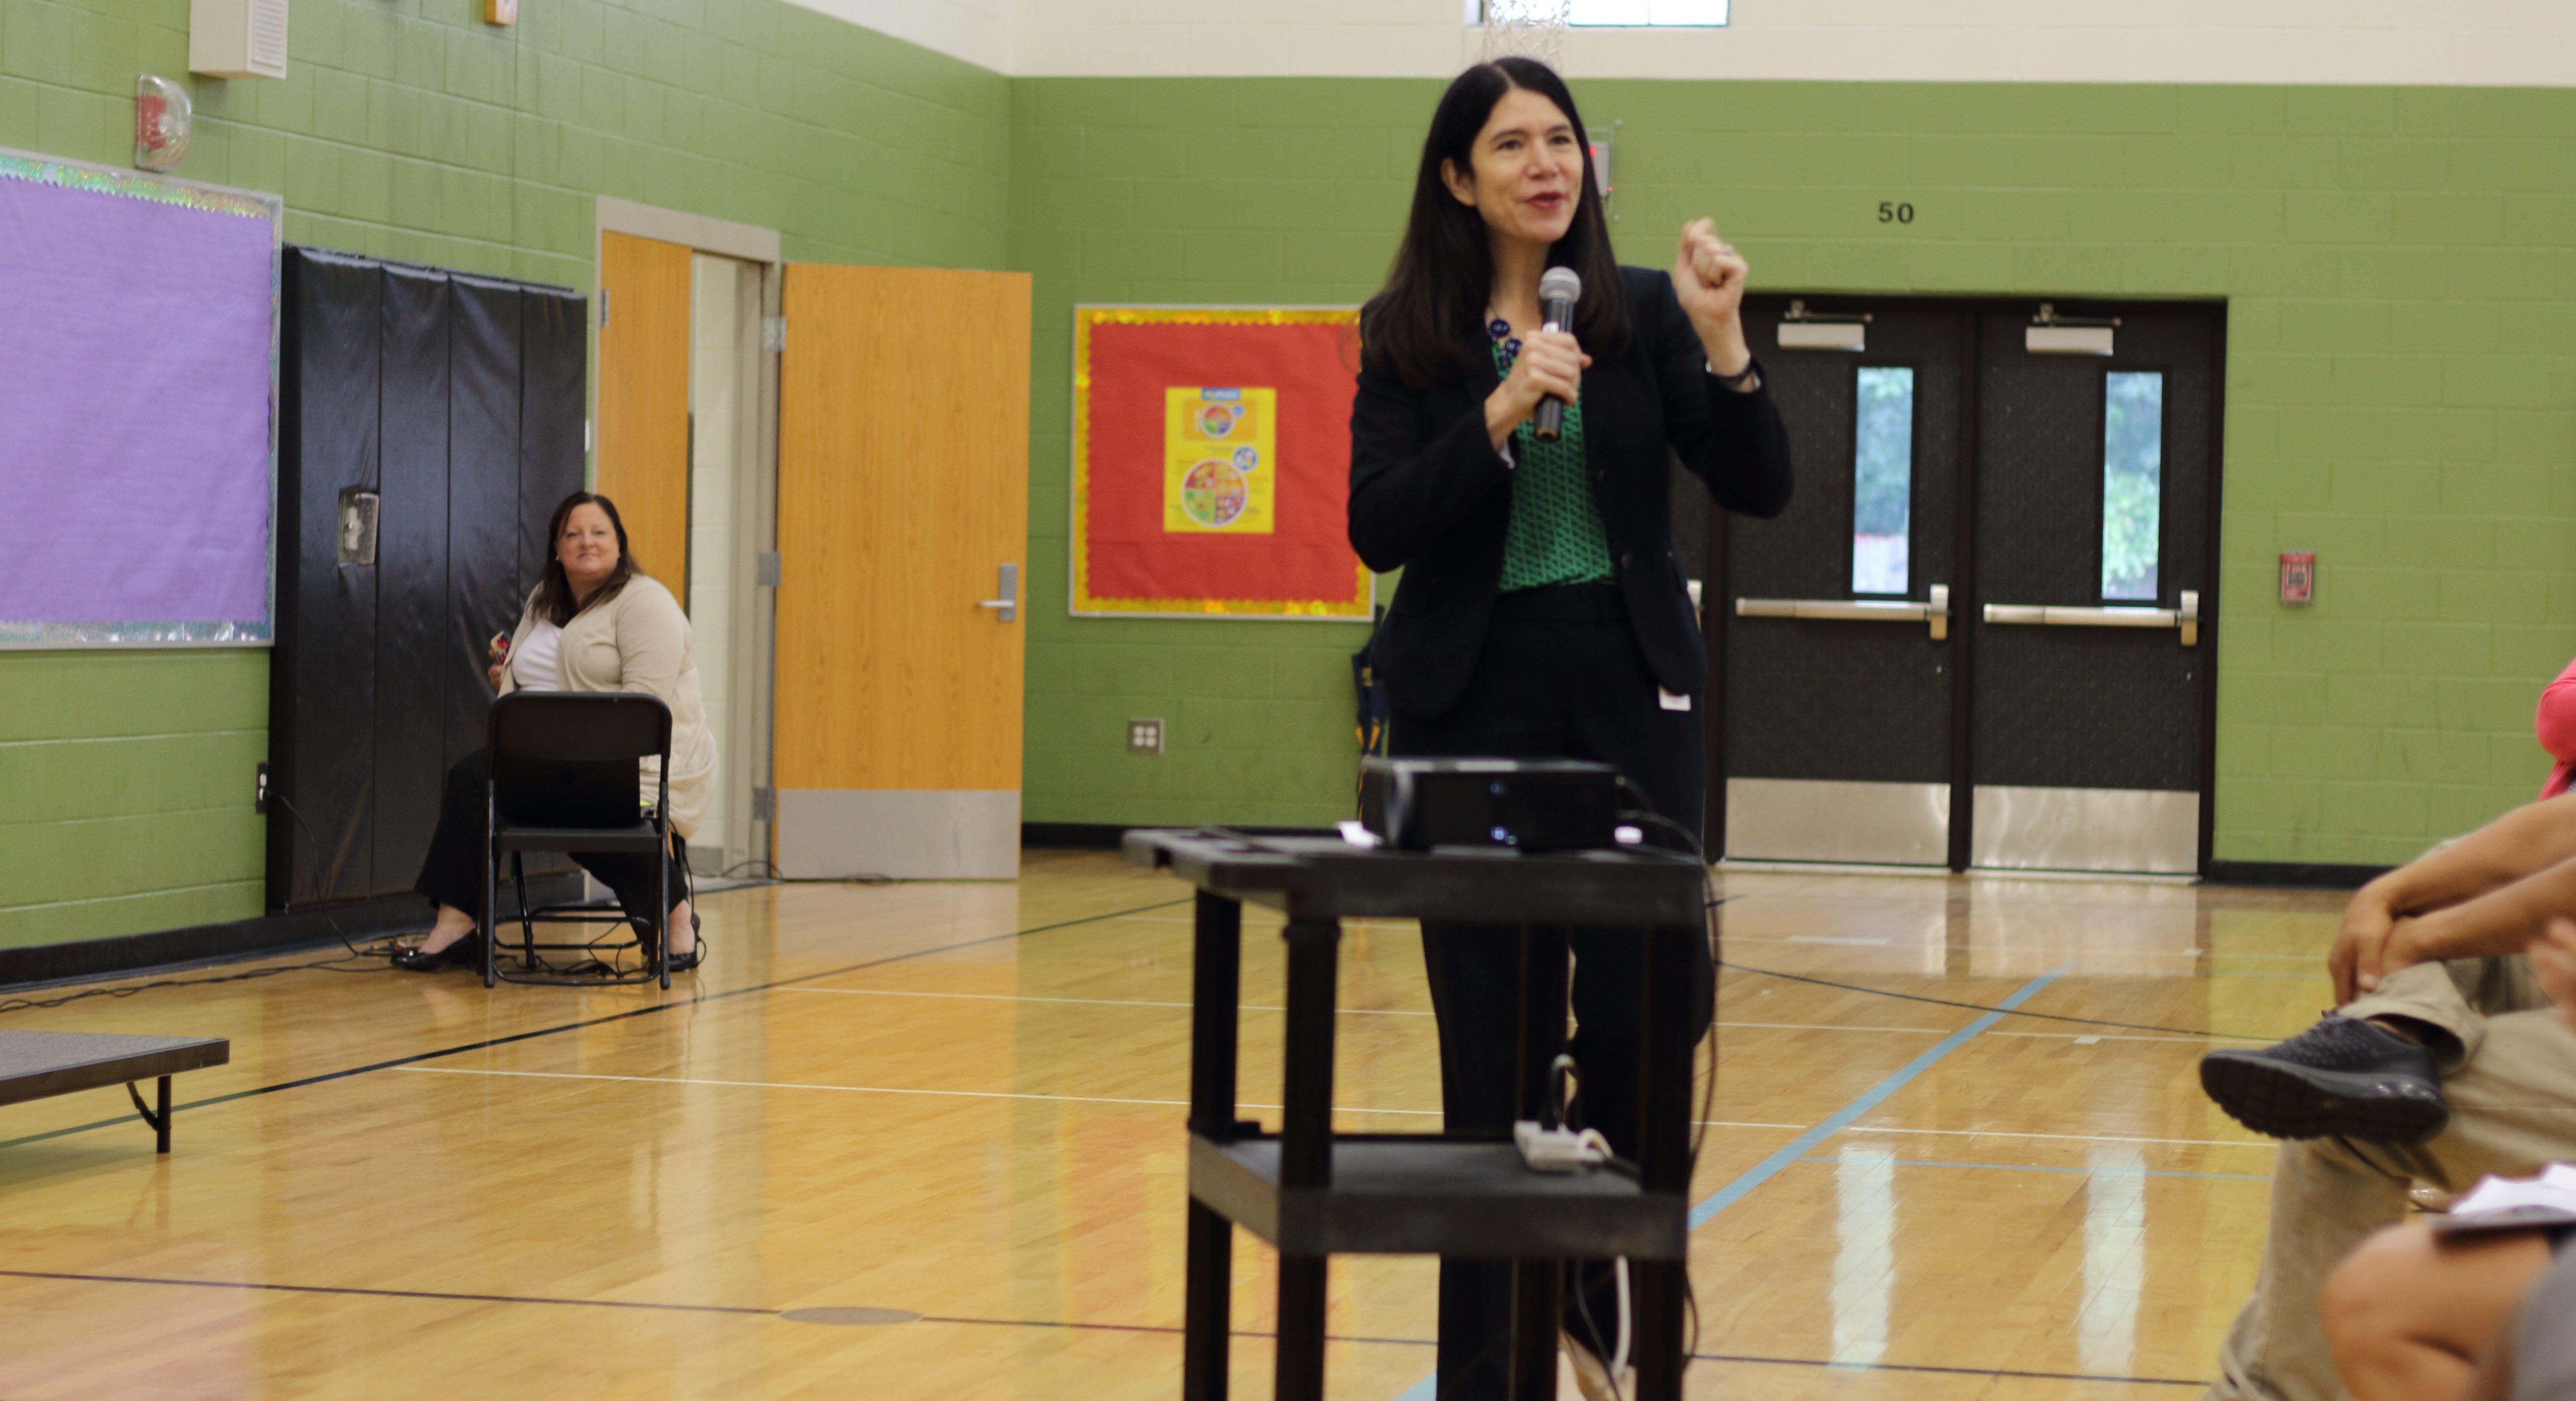 DPSCD Superintendent Alycia Meriweather PHOTO CREDIT: Alisha Dixon